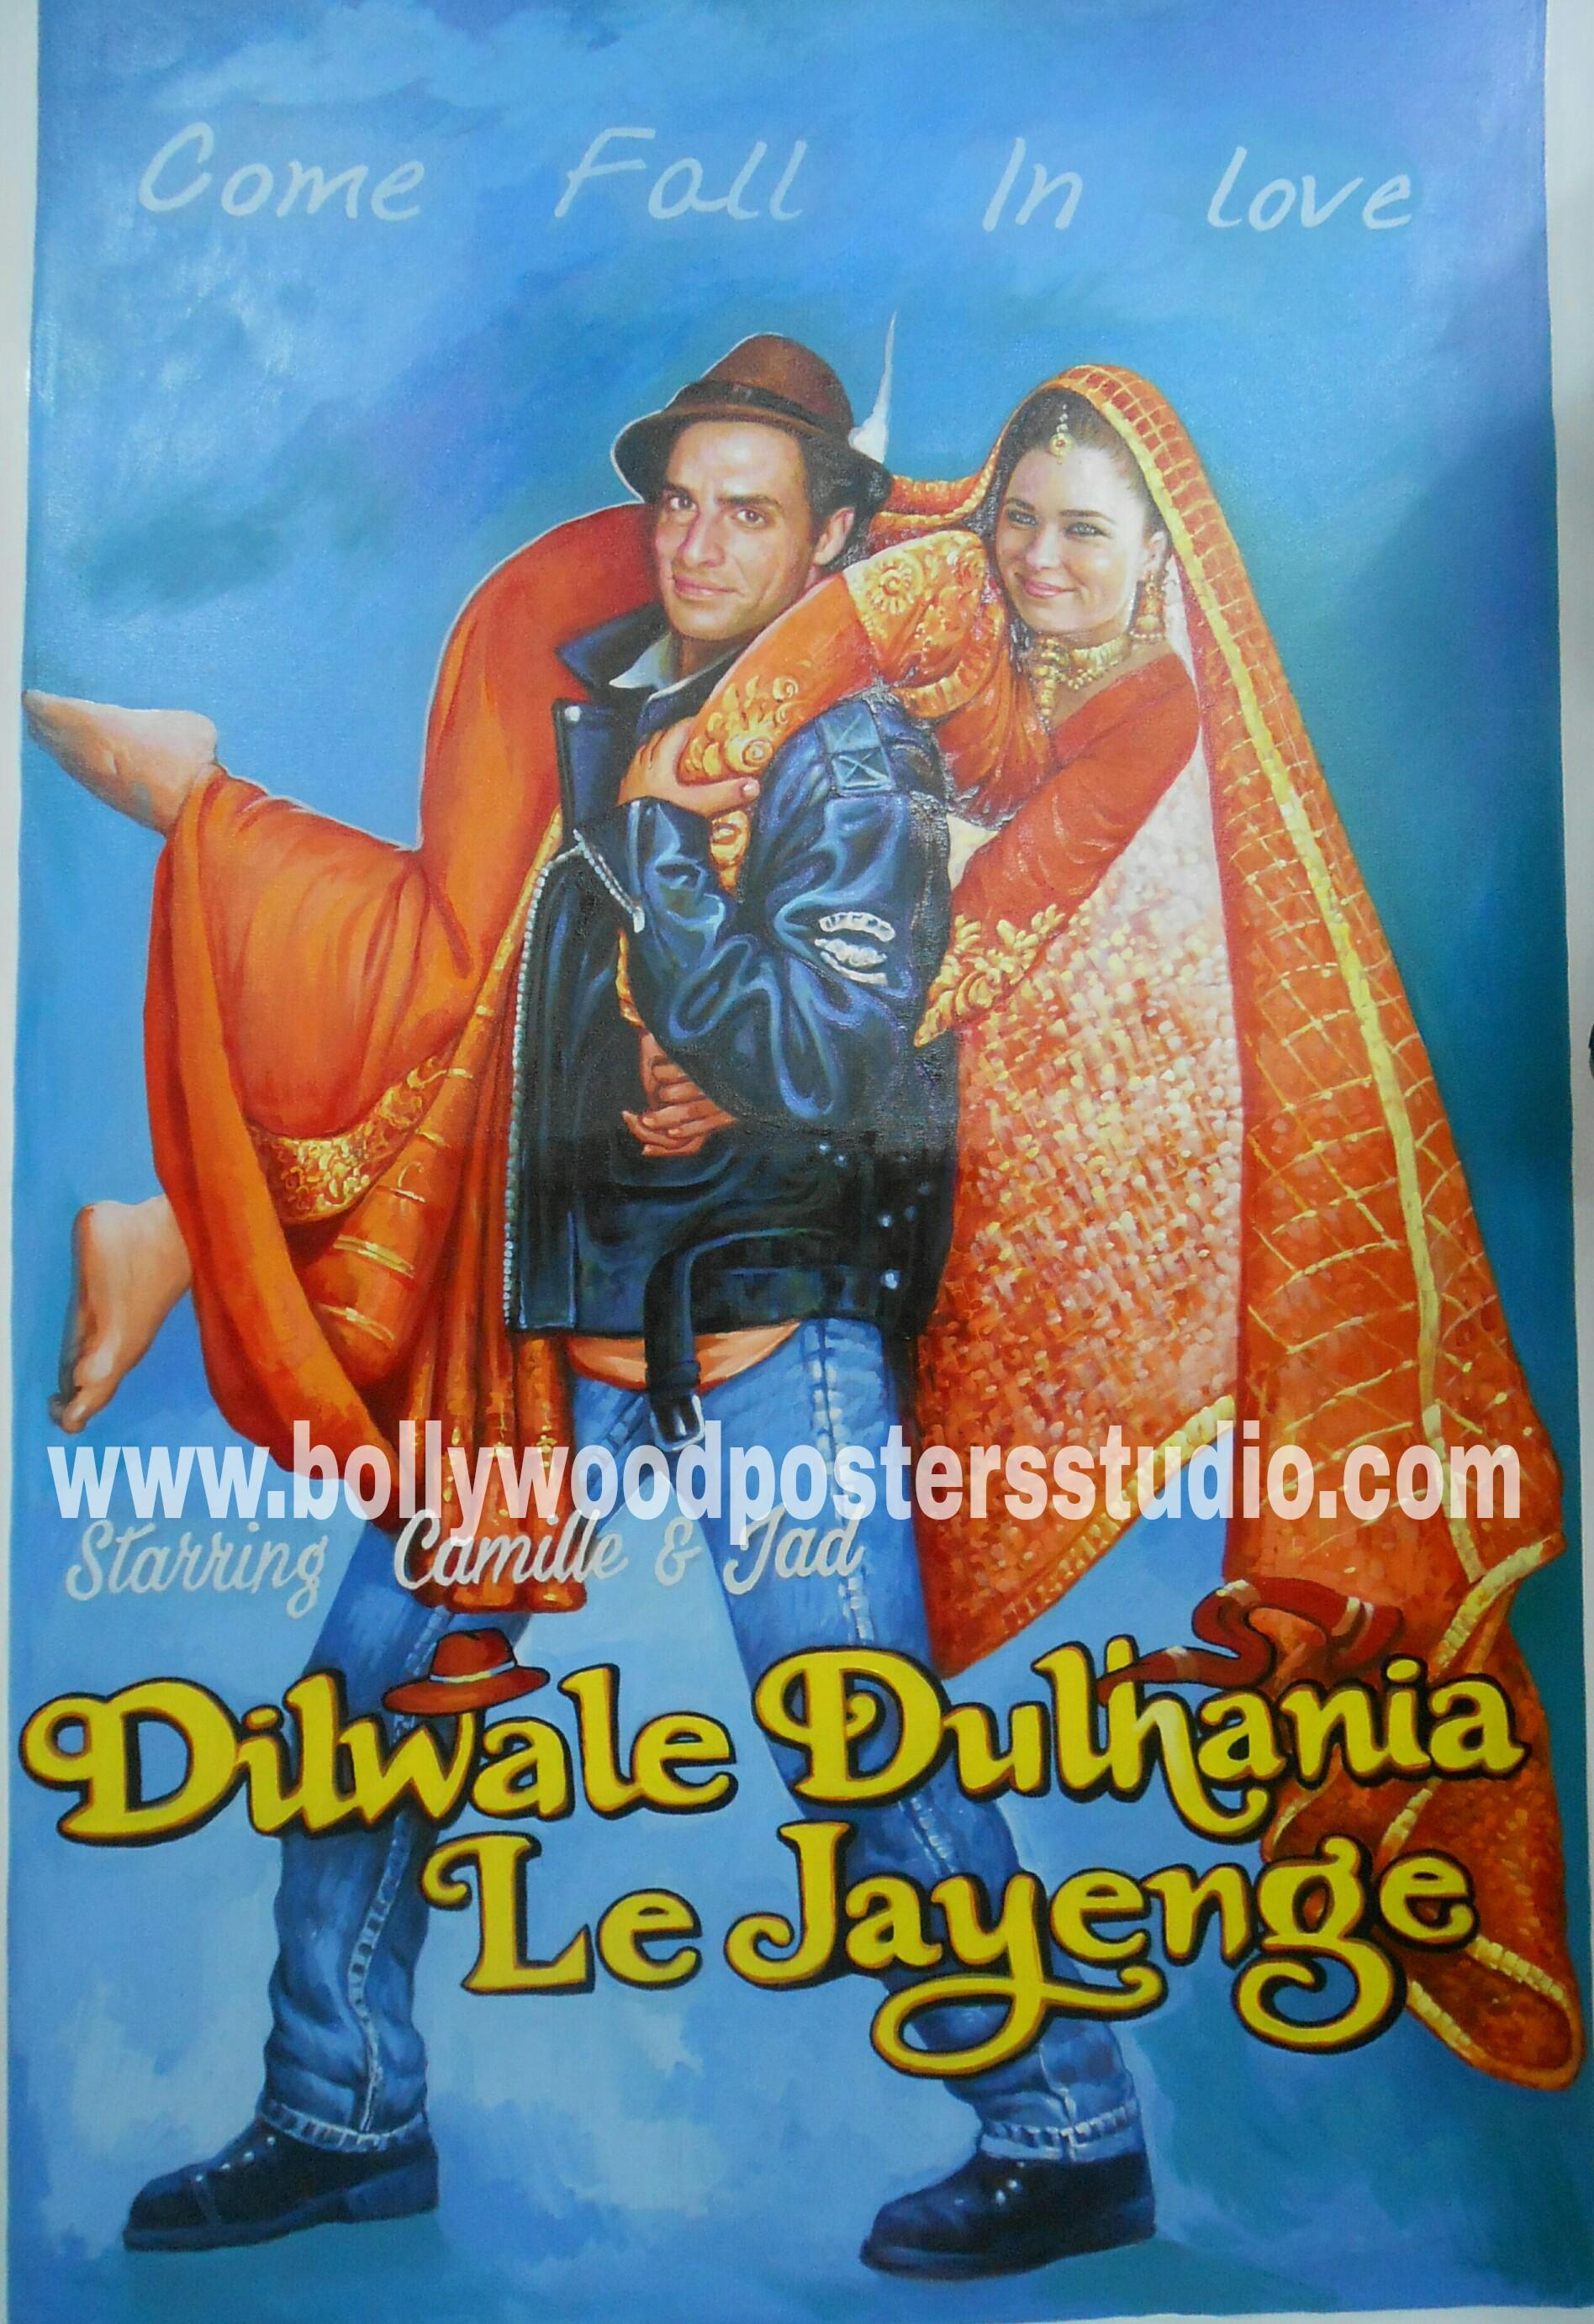 Bollywood poster maker